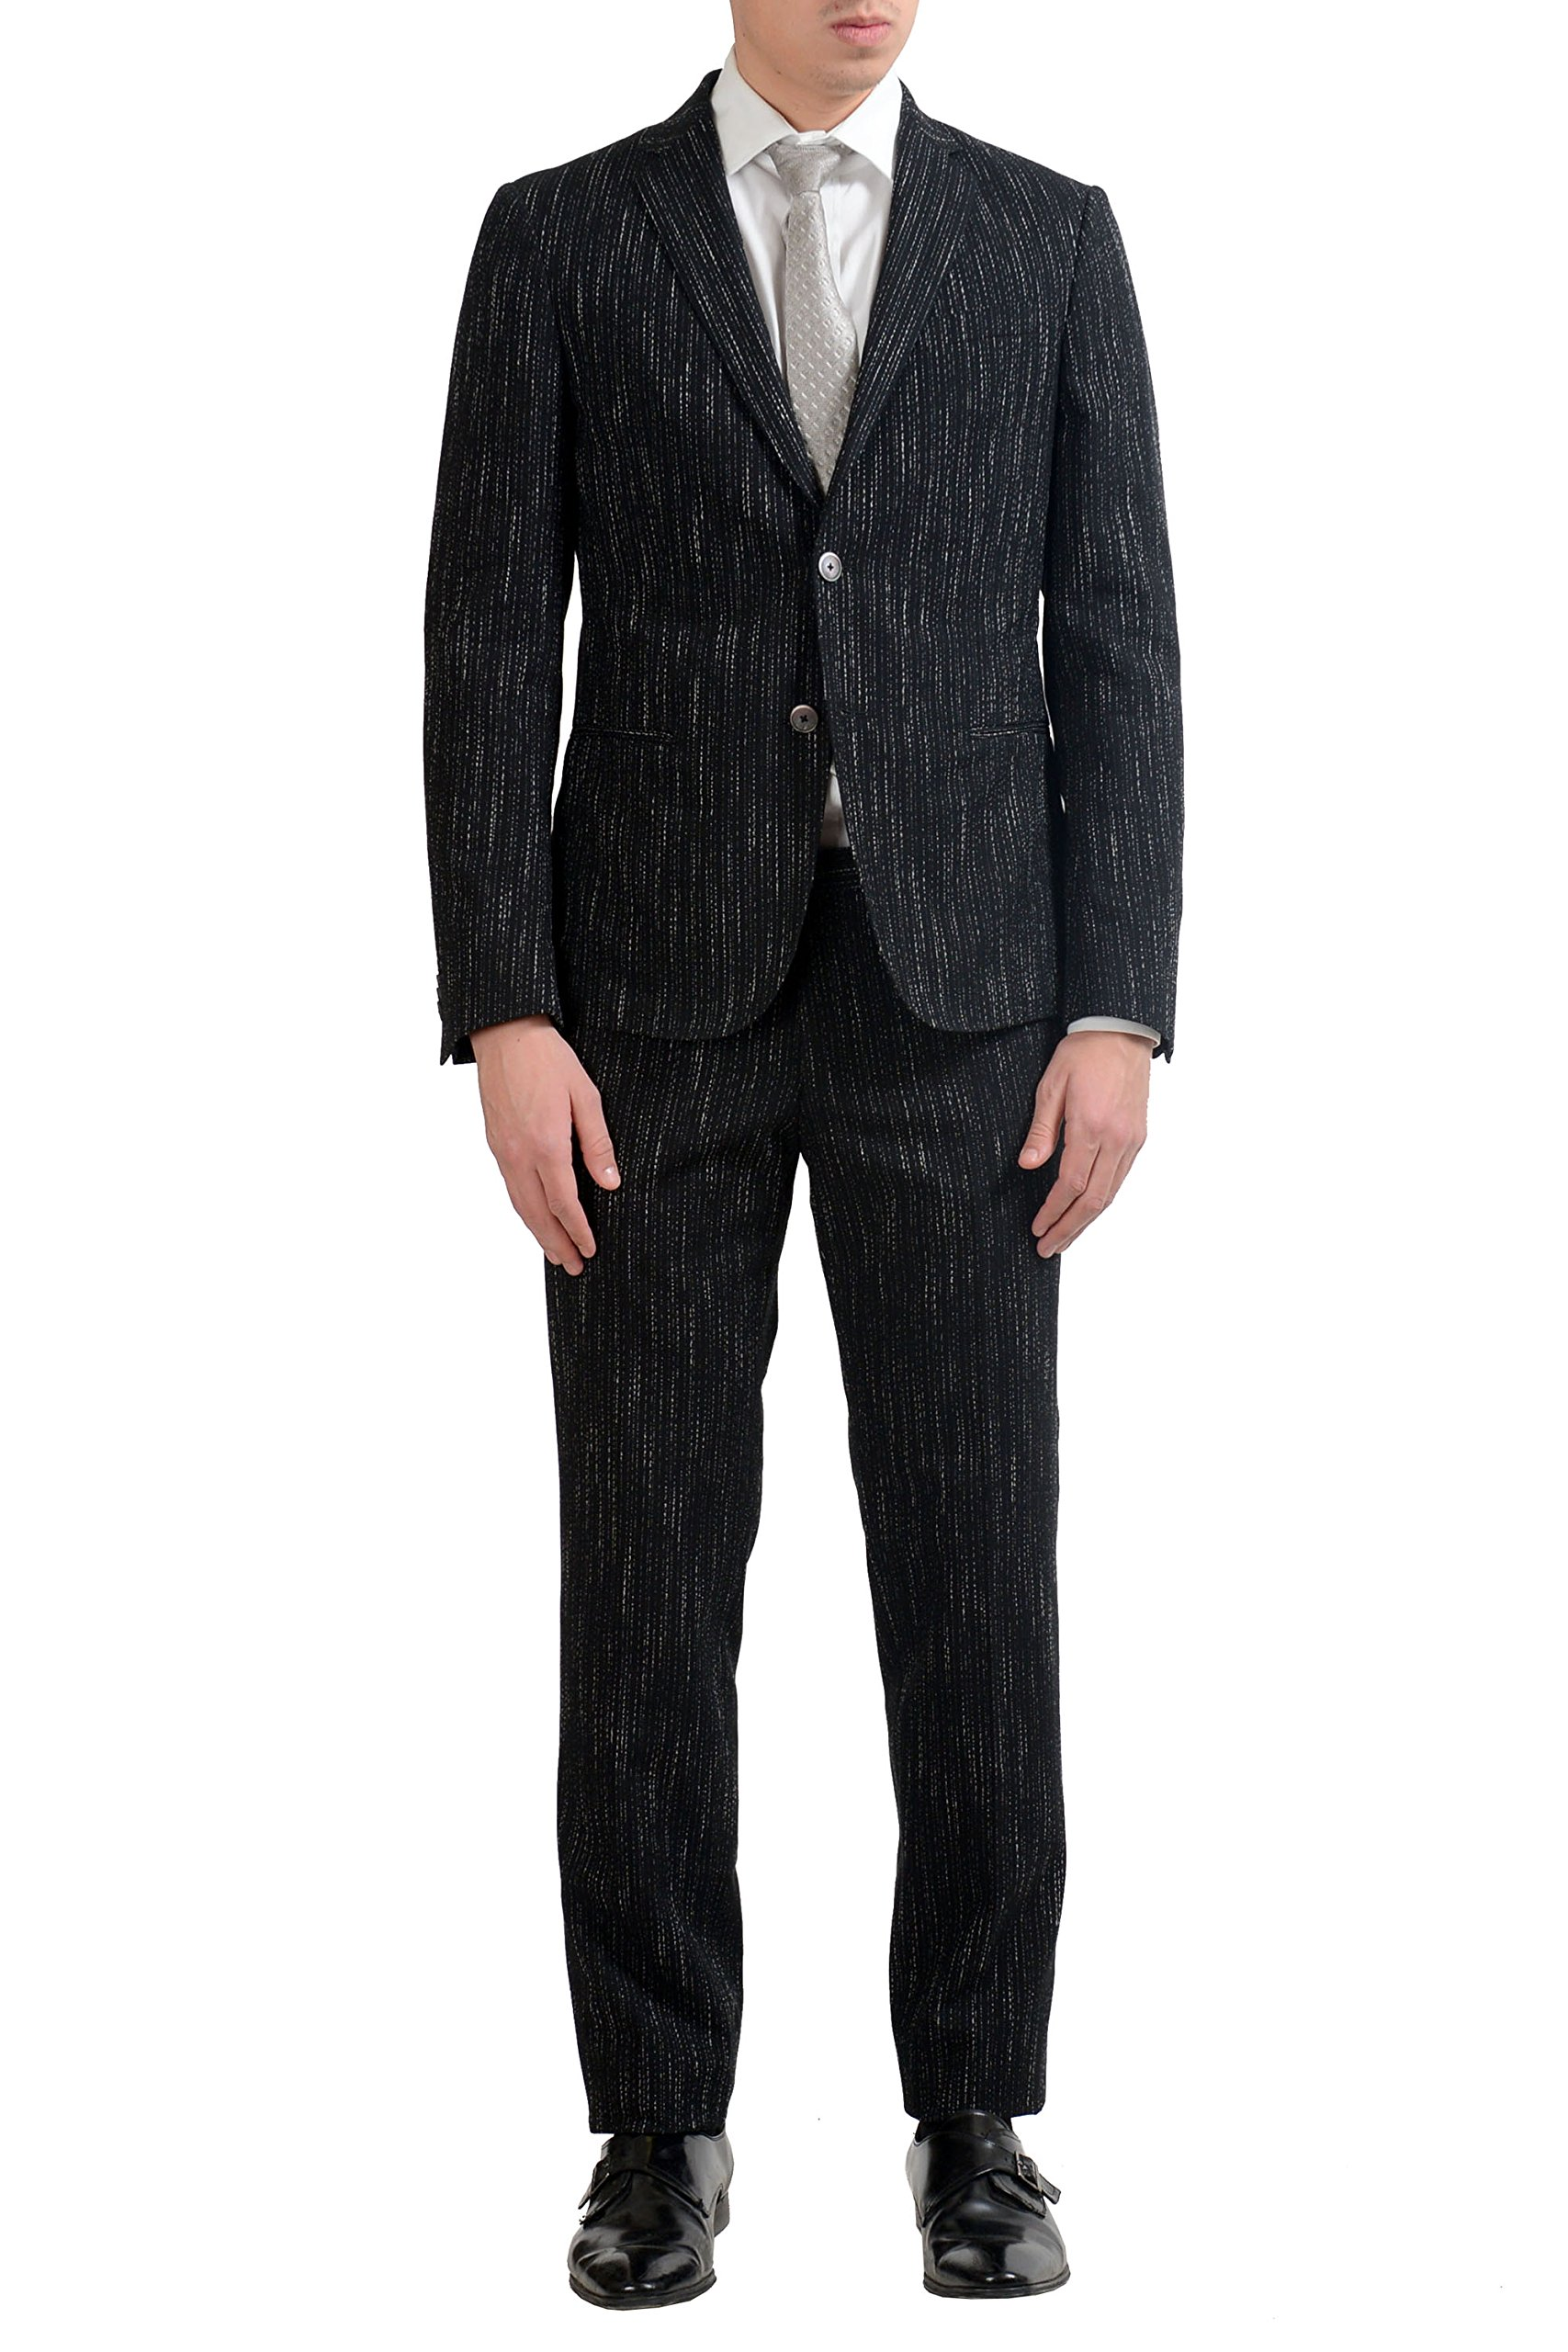 Hugo Boss ''Nivan/Benno1'' Men's Stretch Travel Two Button Suit US 38R IT 48R